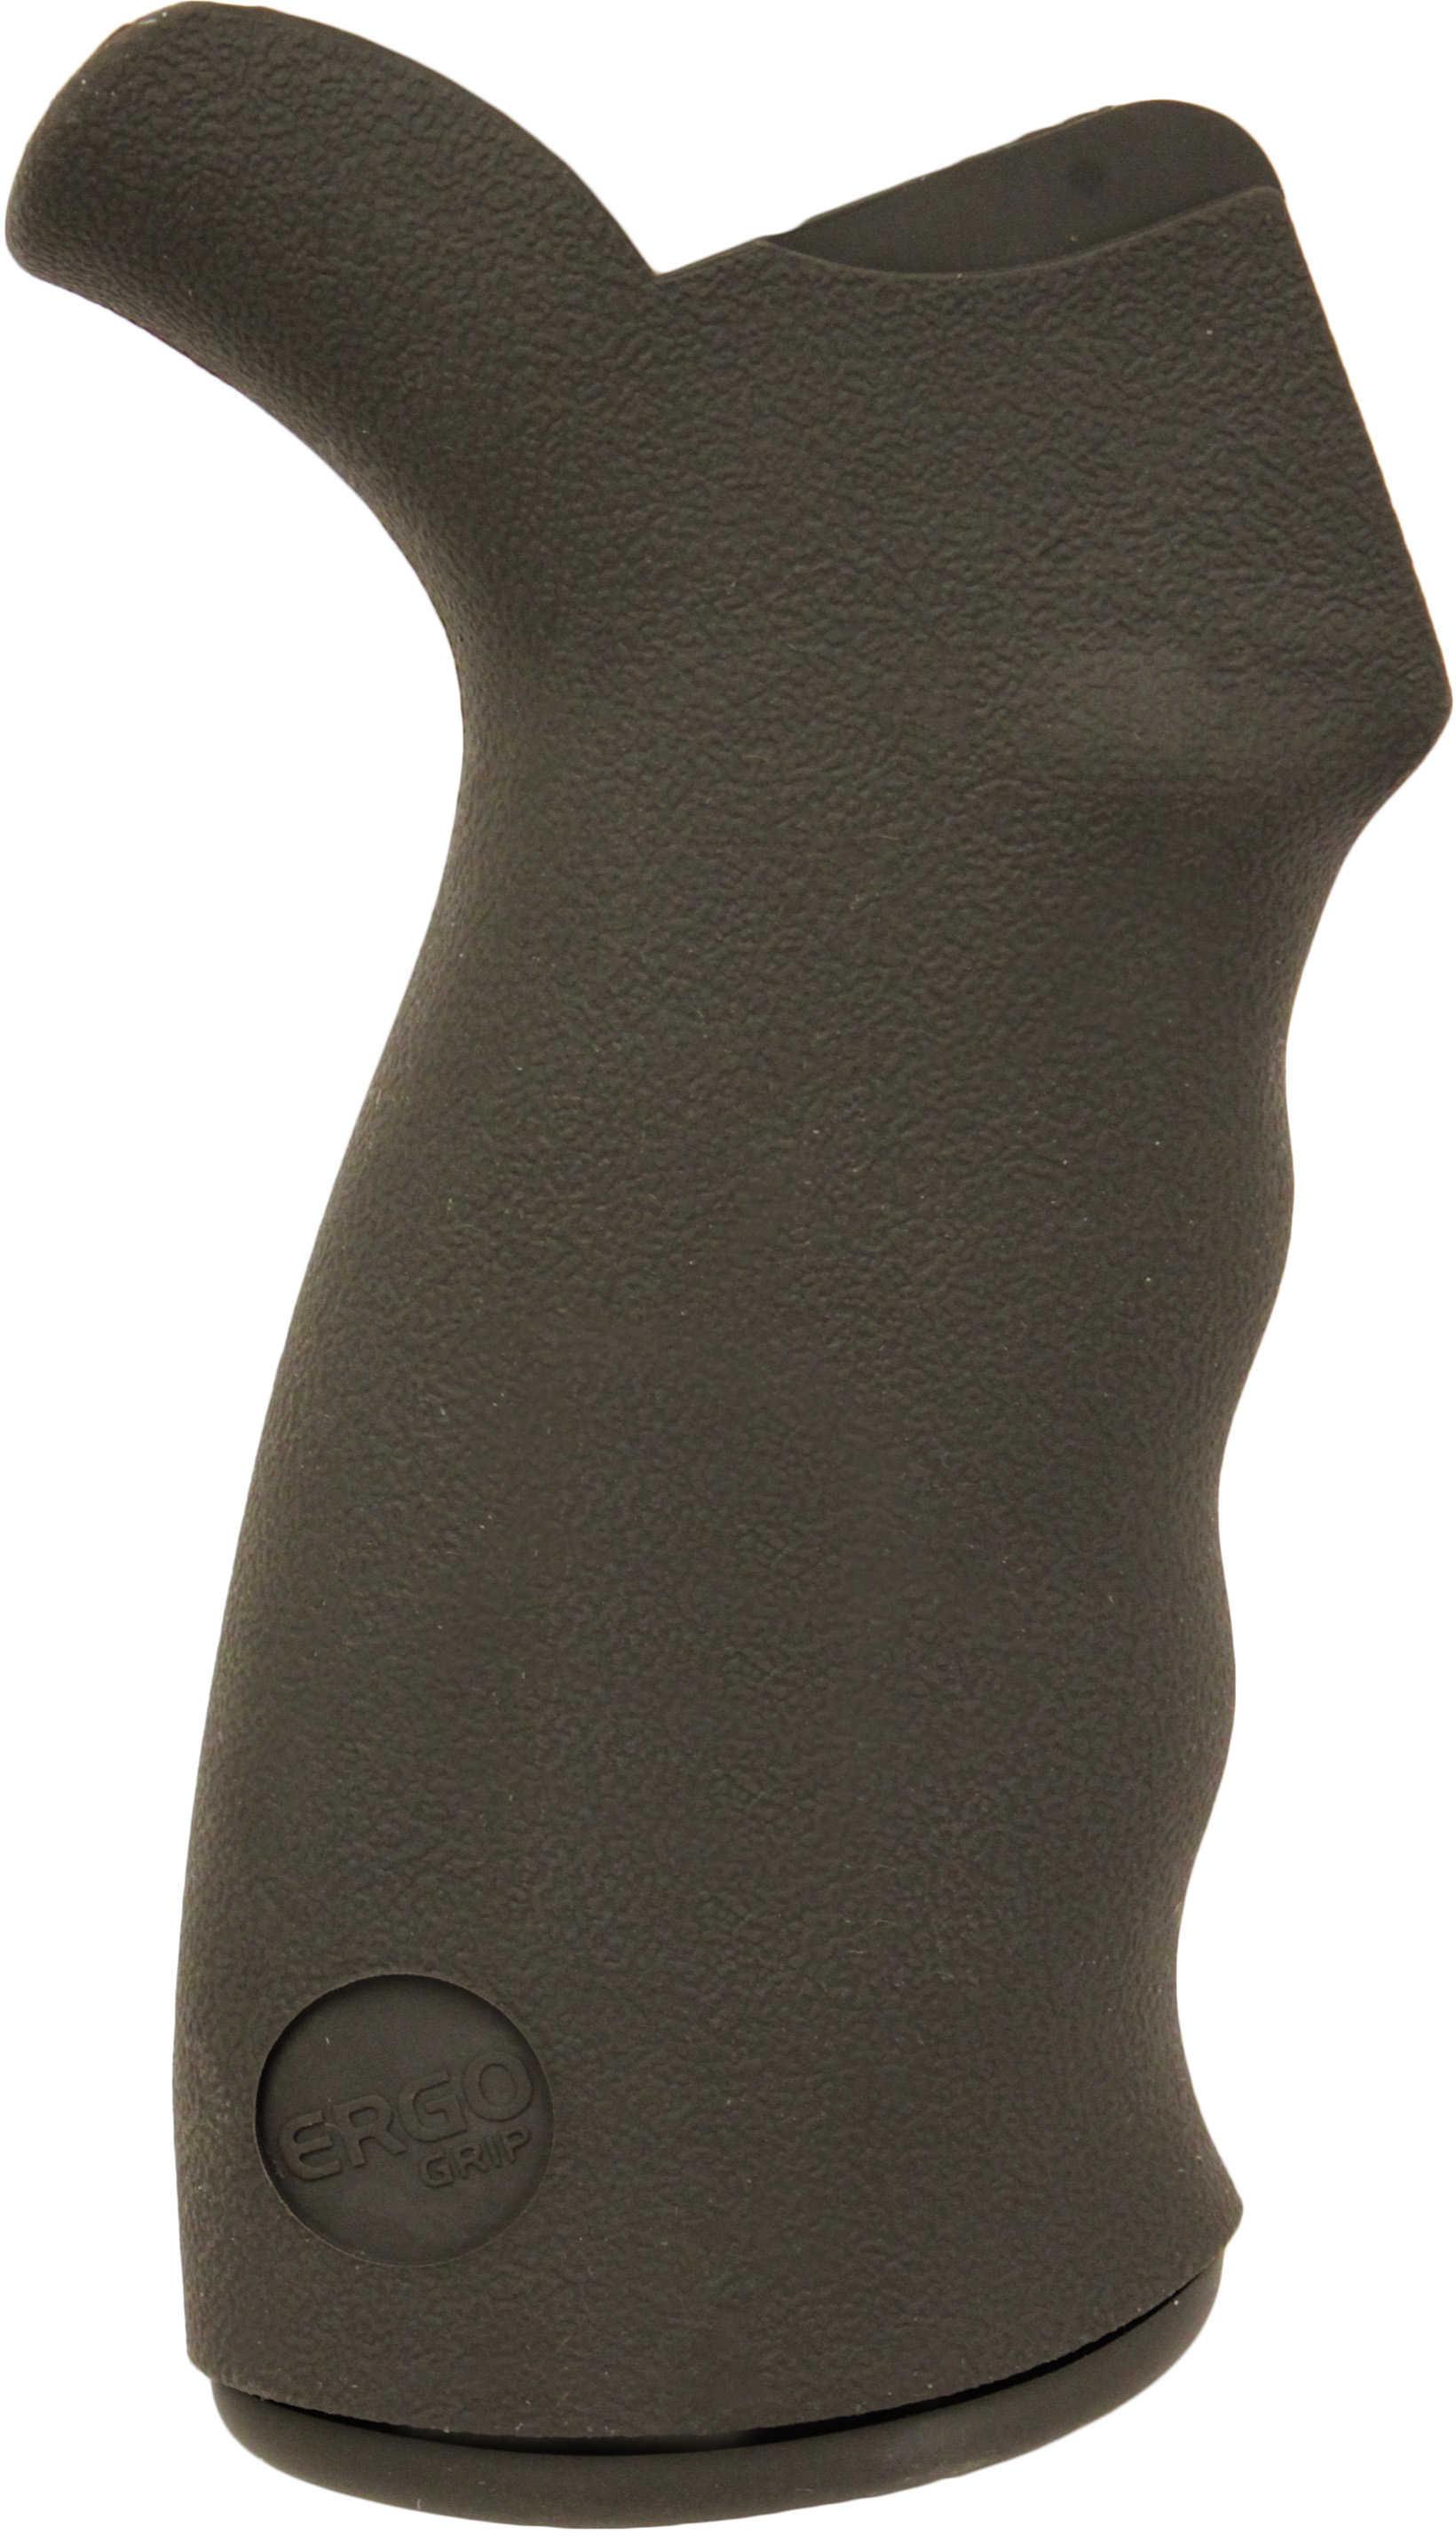 Enhanced AR15/M16 Suregrip Ambidextrous Olive Drab Md: 4011-OD